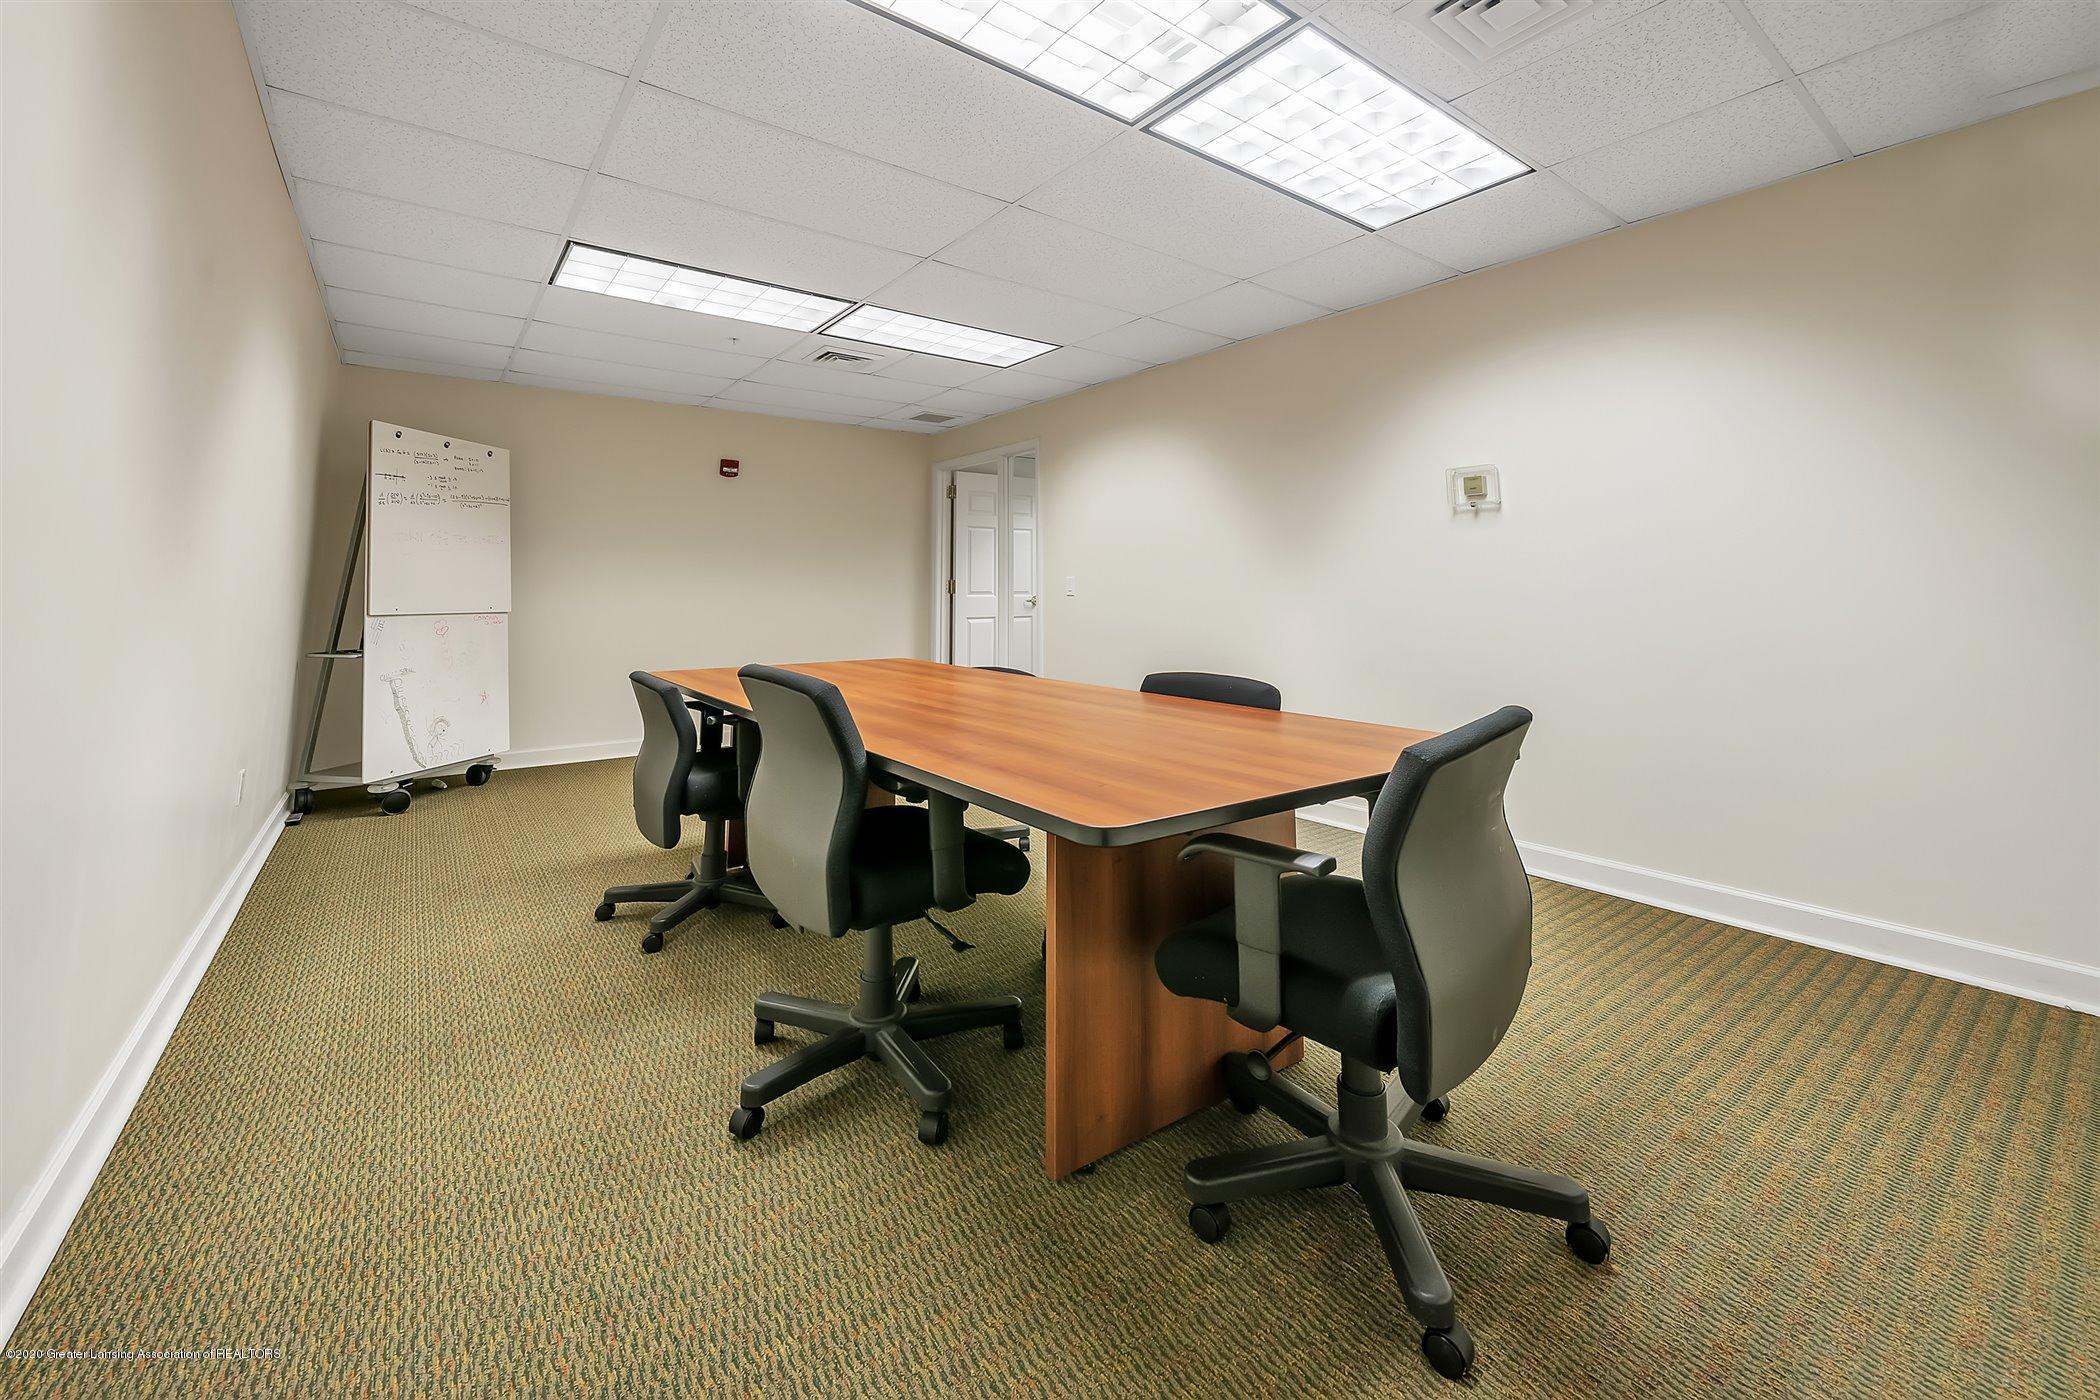 220 M. A. C. Ave Apt 409 - Business Center - 31